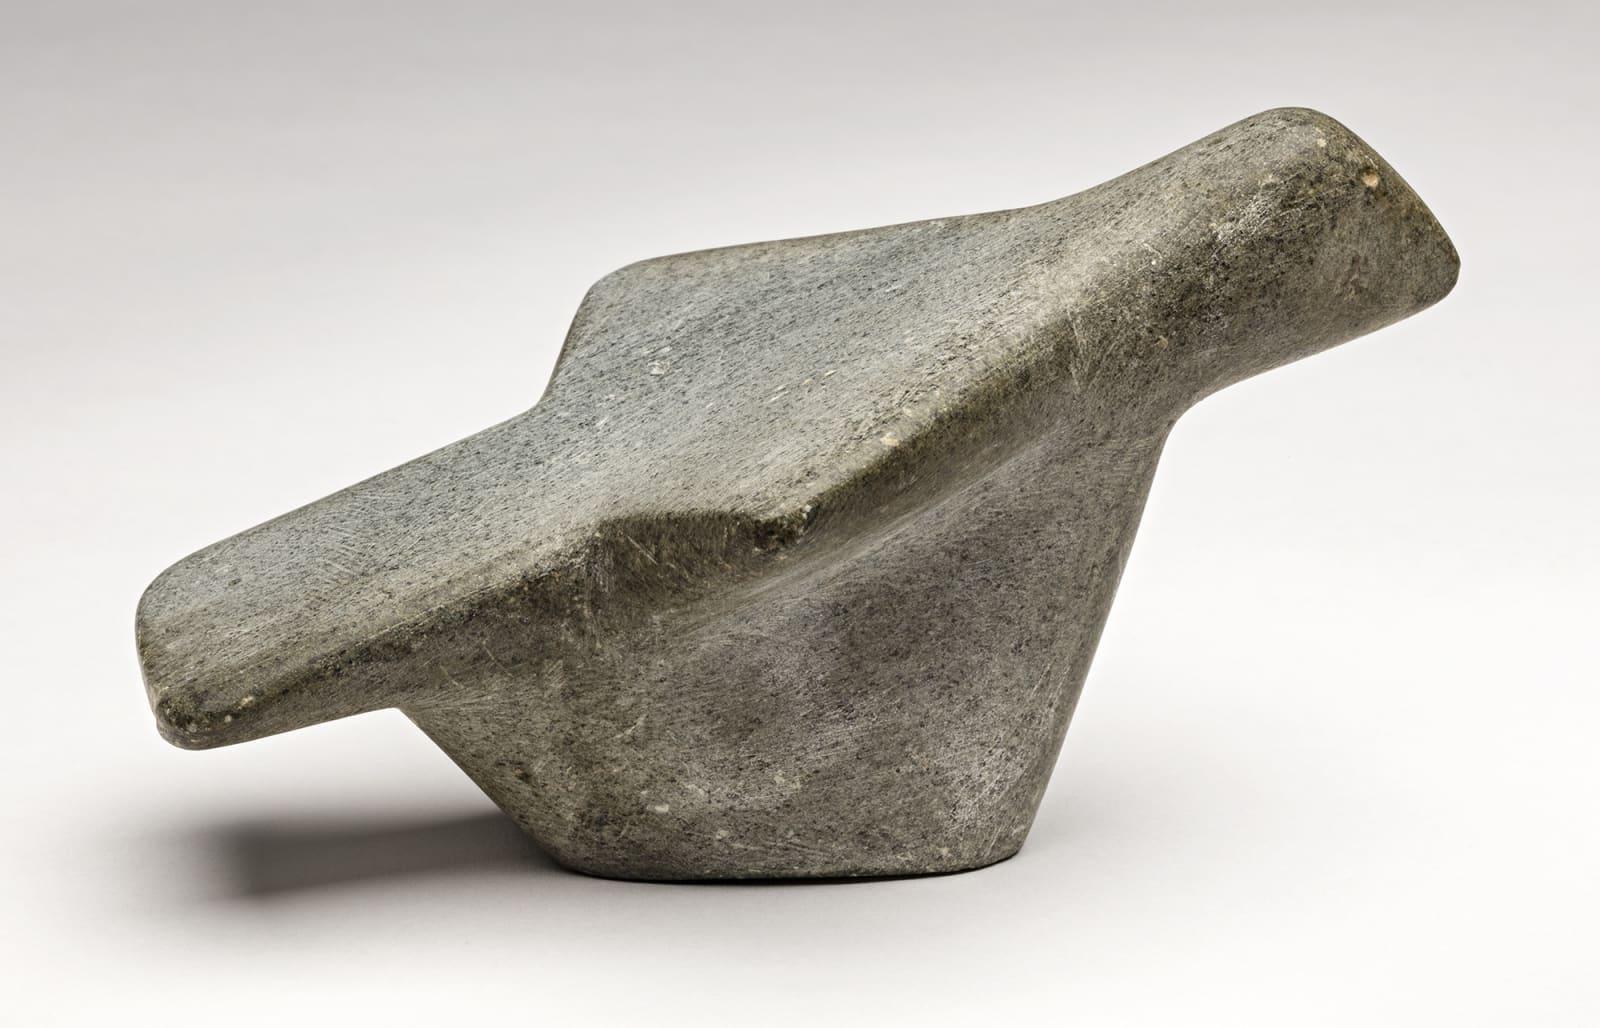 Lot 3 ANDY MIKI (1918-1983), ARVIAT (ESKIMO POINT) Bird in Flight, c. 1967-69 stone, 3.75 x 4.5 x 6.75 in (9.5 x 11.4 x 17.1 cm) Estimate: $3,500 — $5,000